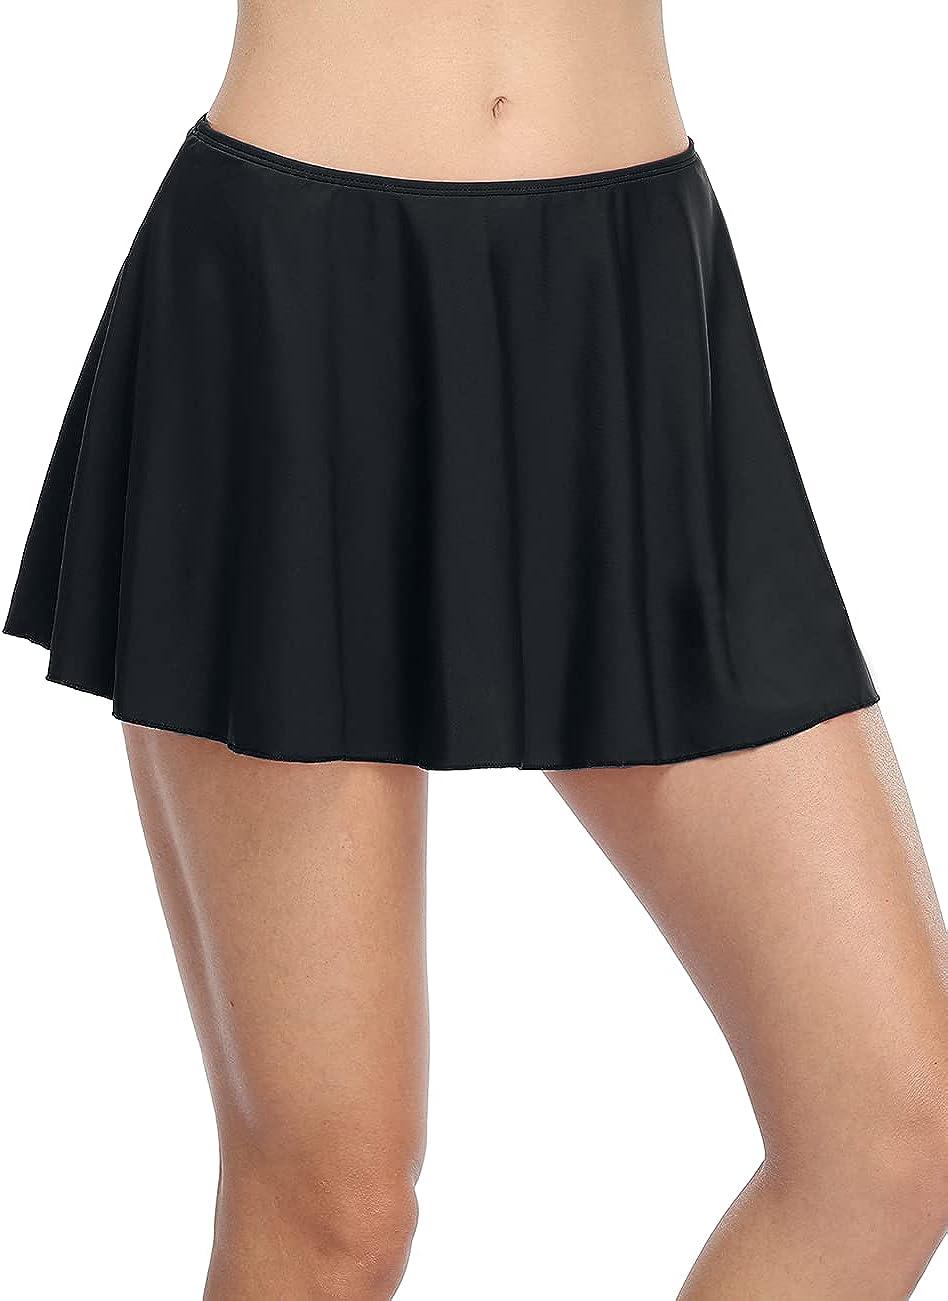 Hilor Women's High Waisted Swim Bottom Skirted Bikini Bottom UPF 50+ Swimsuits Bathing Suits Athletic Swim Skirts